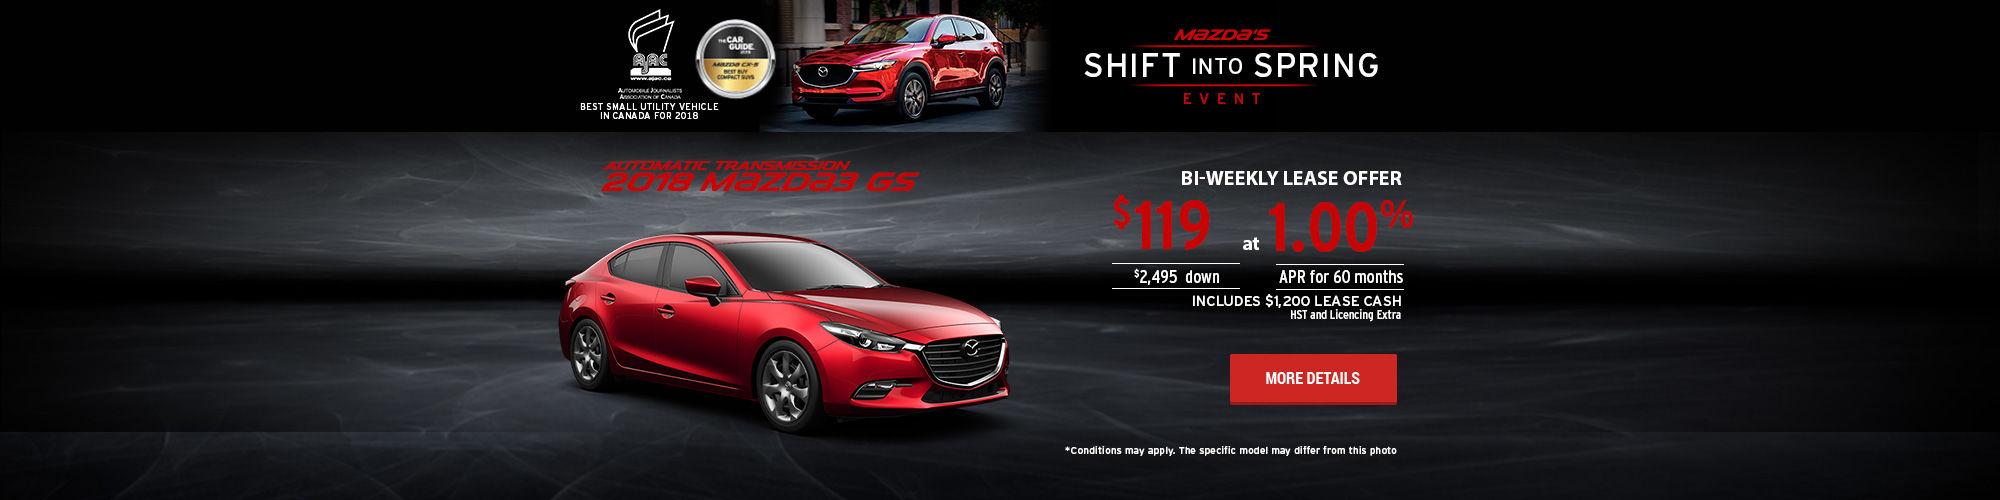 Mazda's Shift Into Spring Event - M3